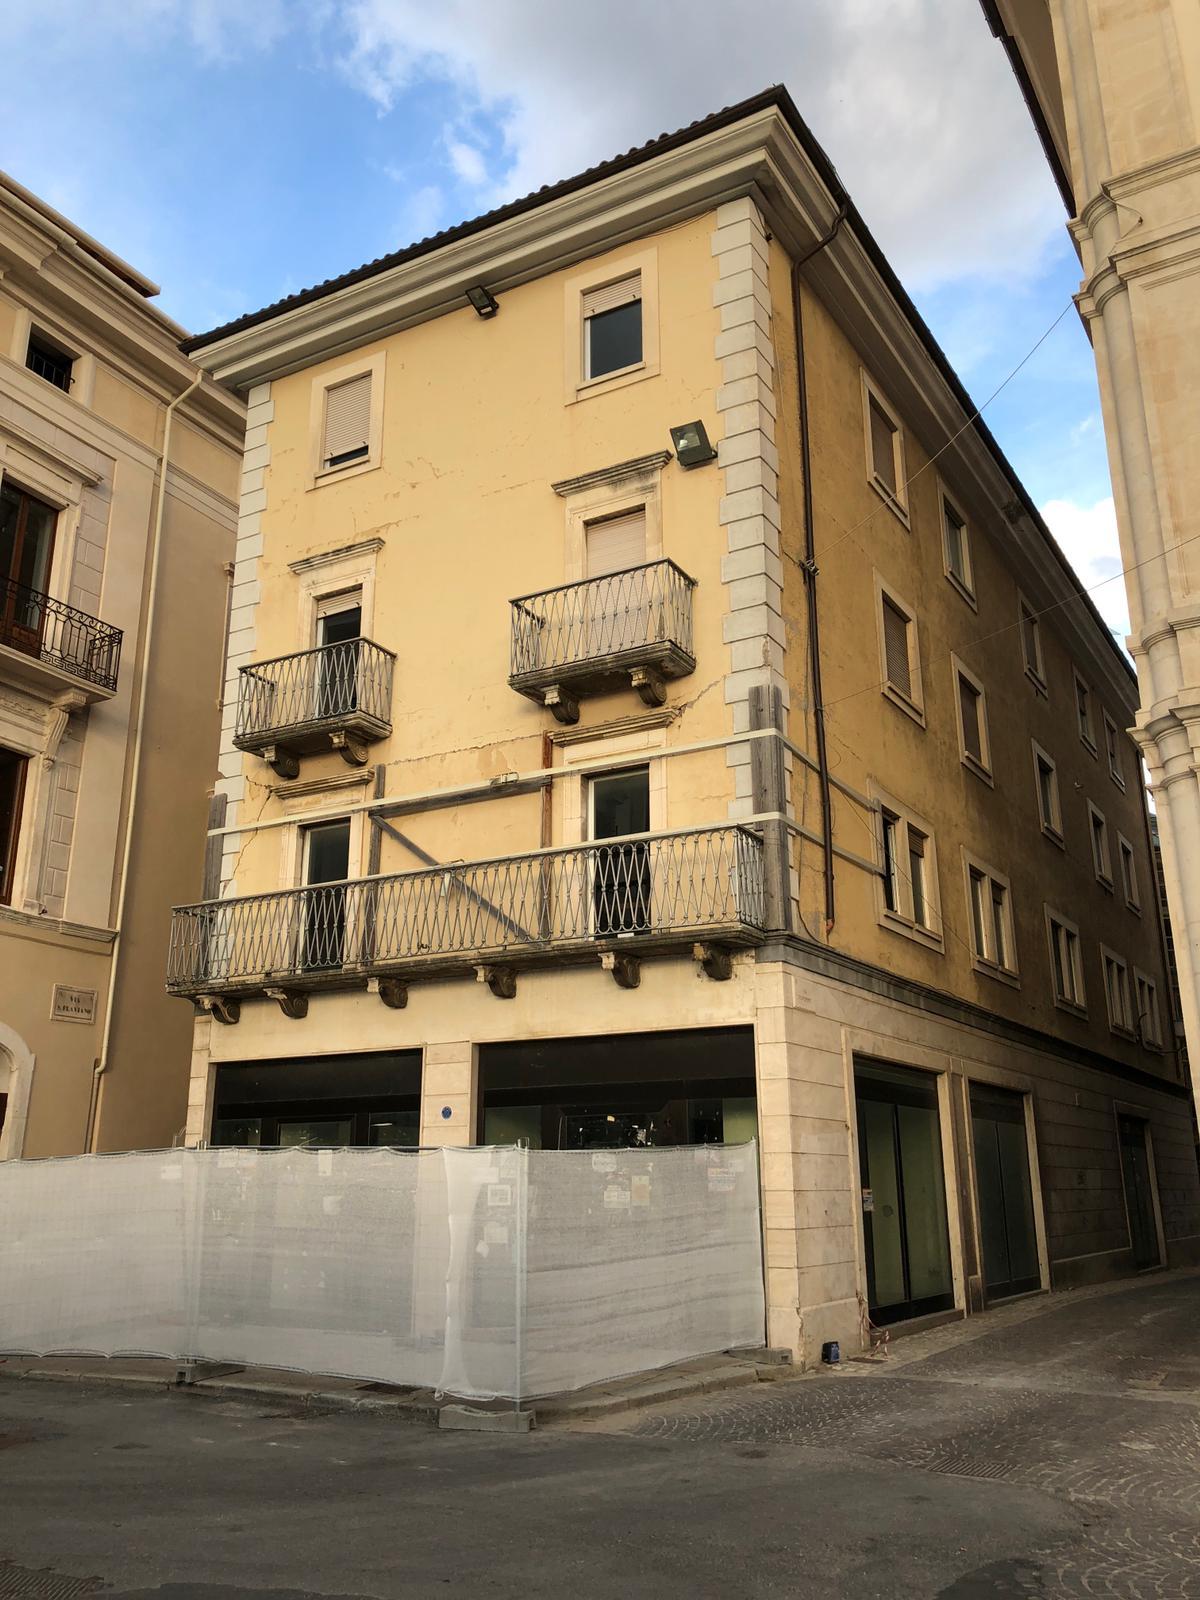 Palazzo Capo Piazza